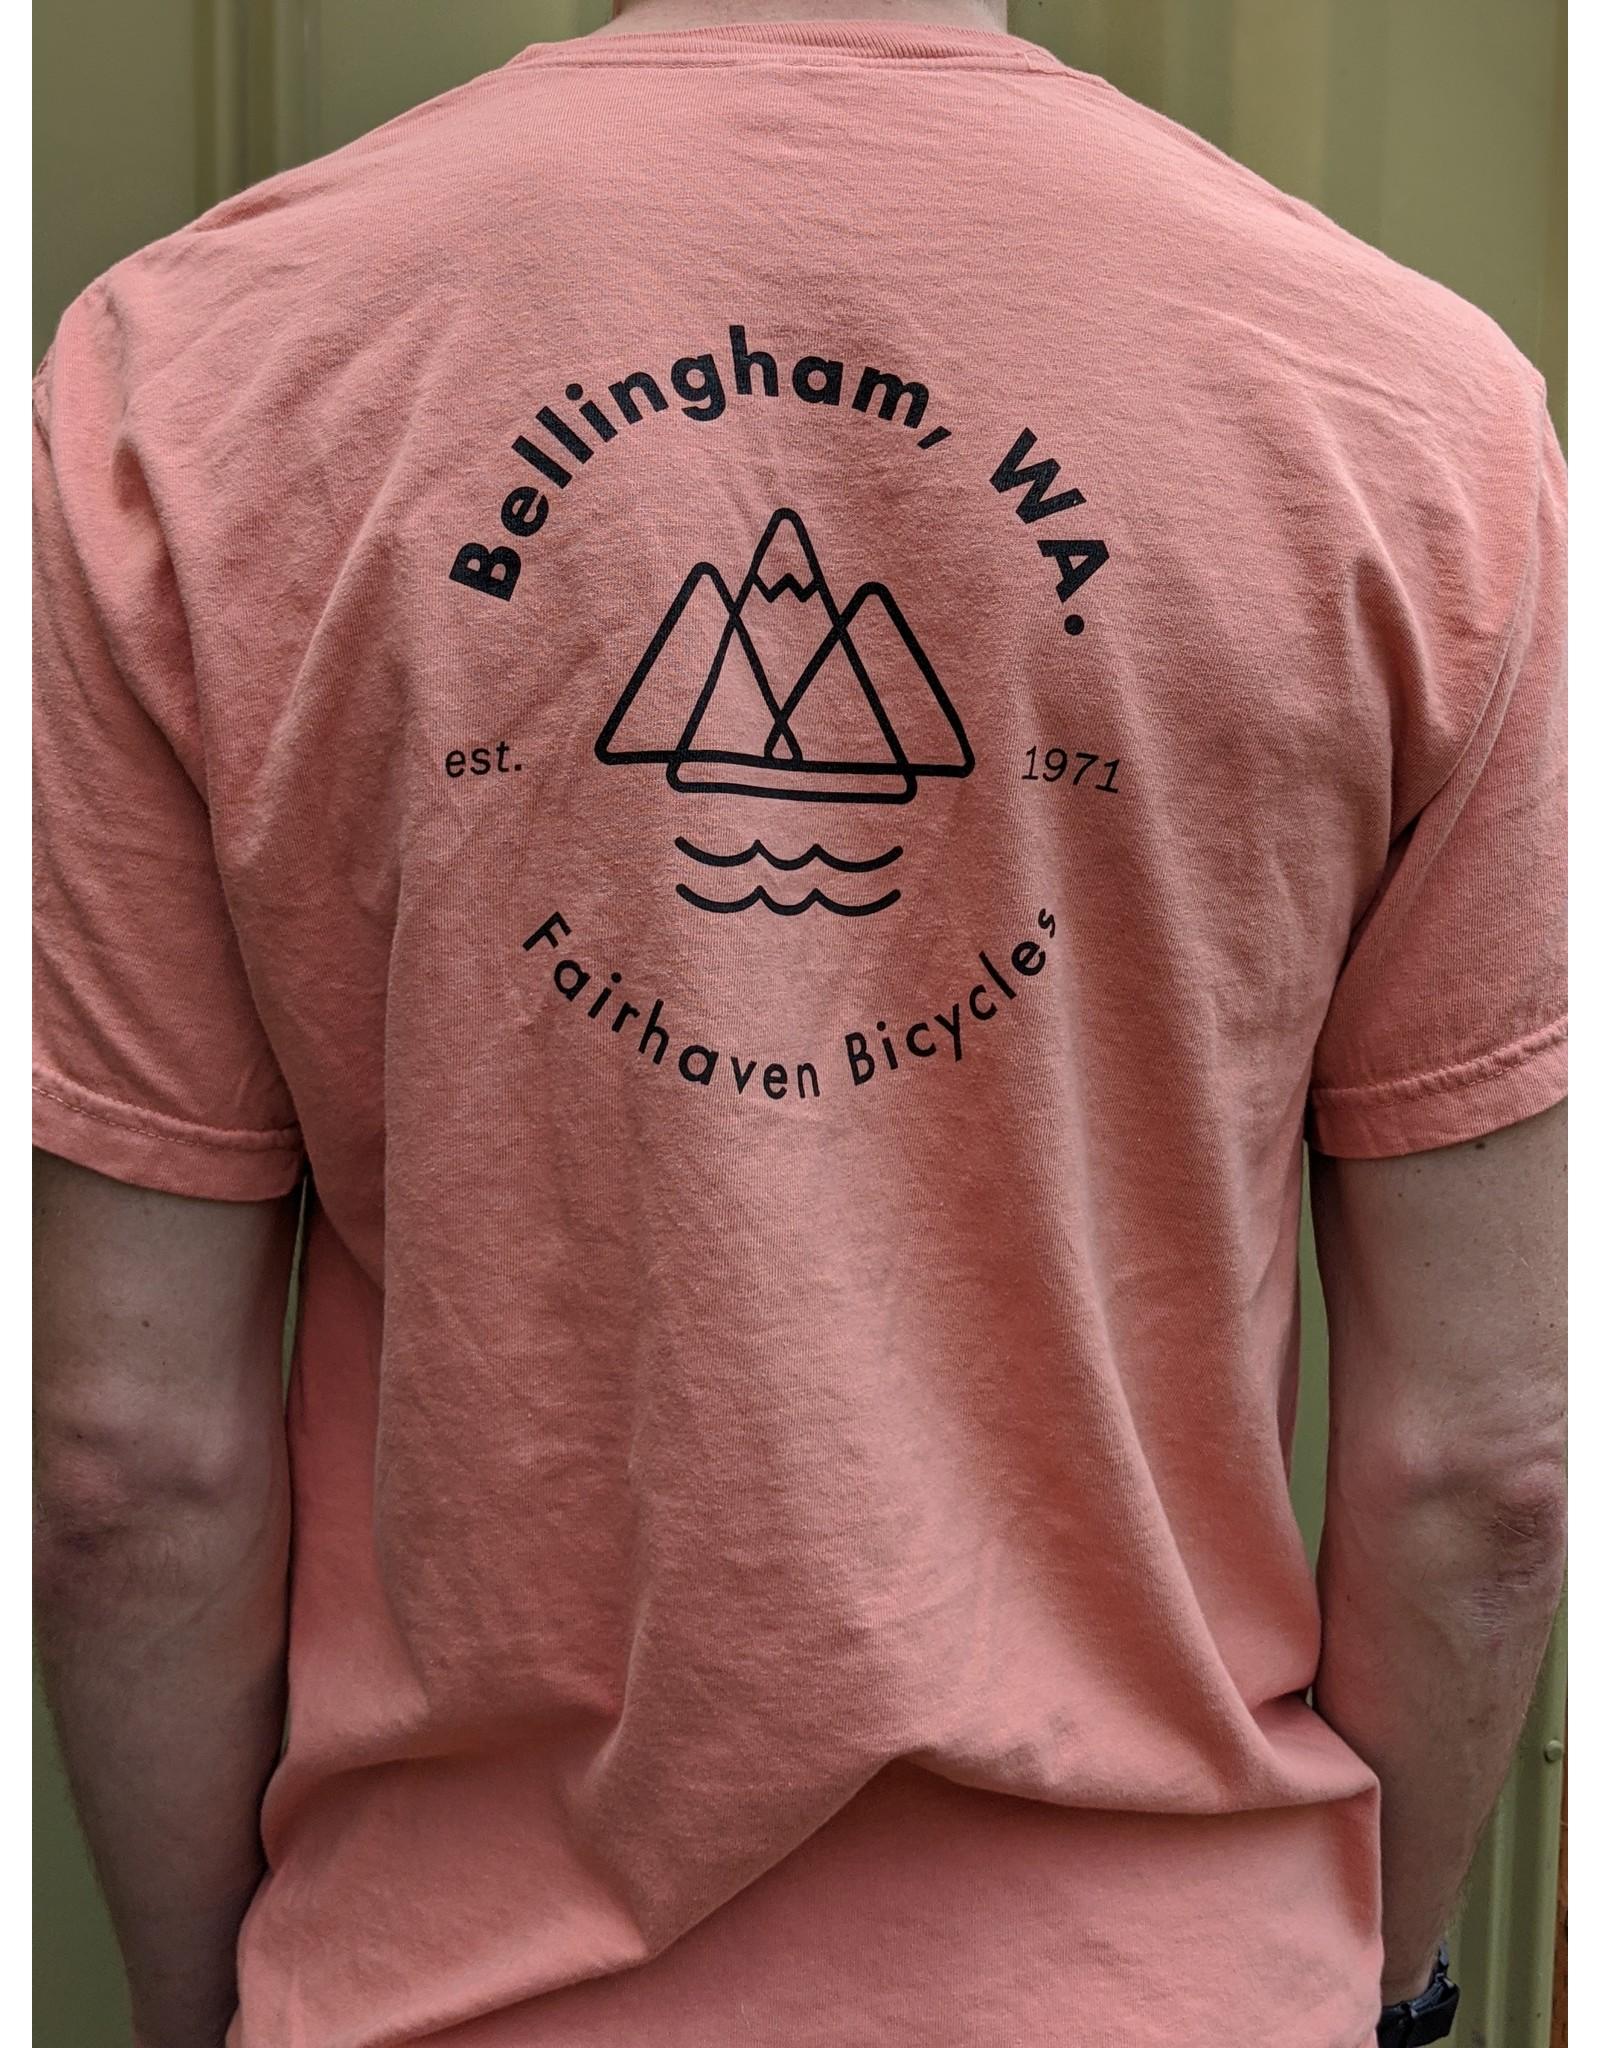 Fairhaven Bicycles T-Shirt -